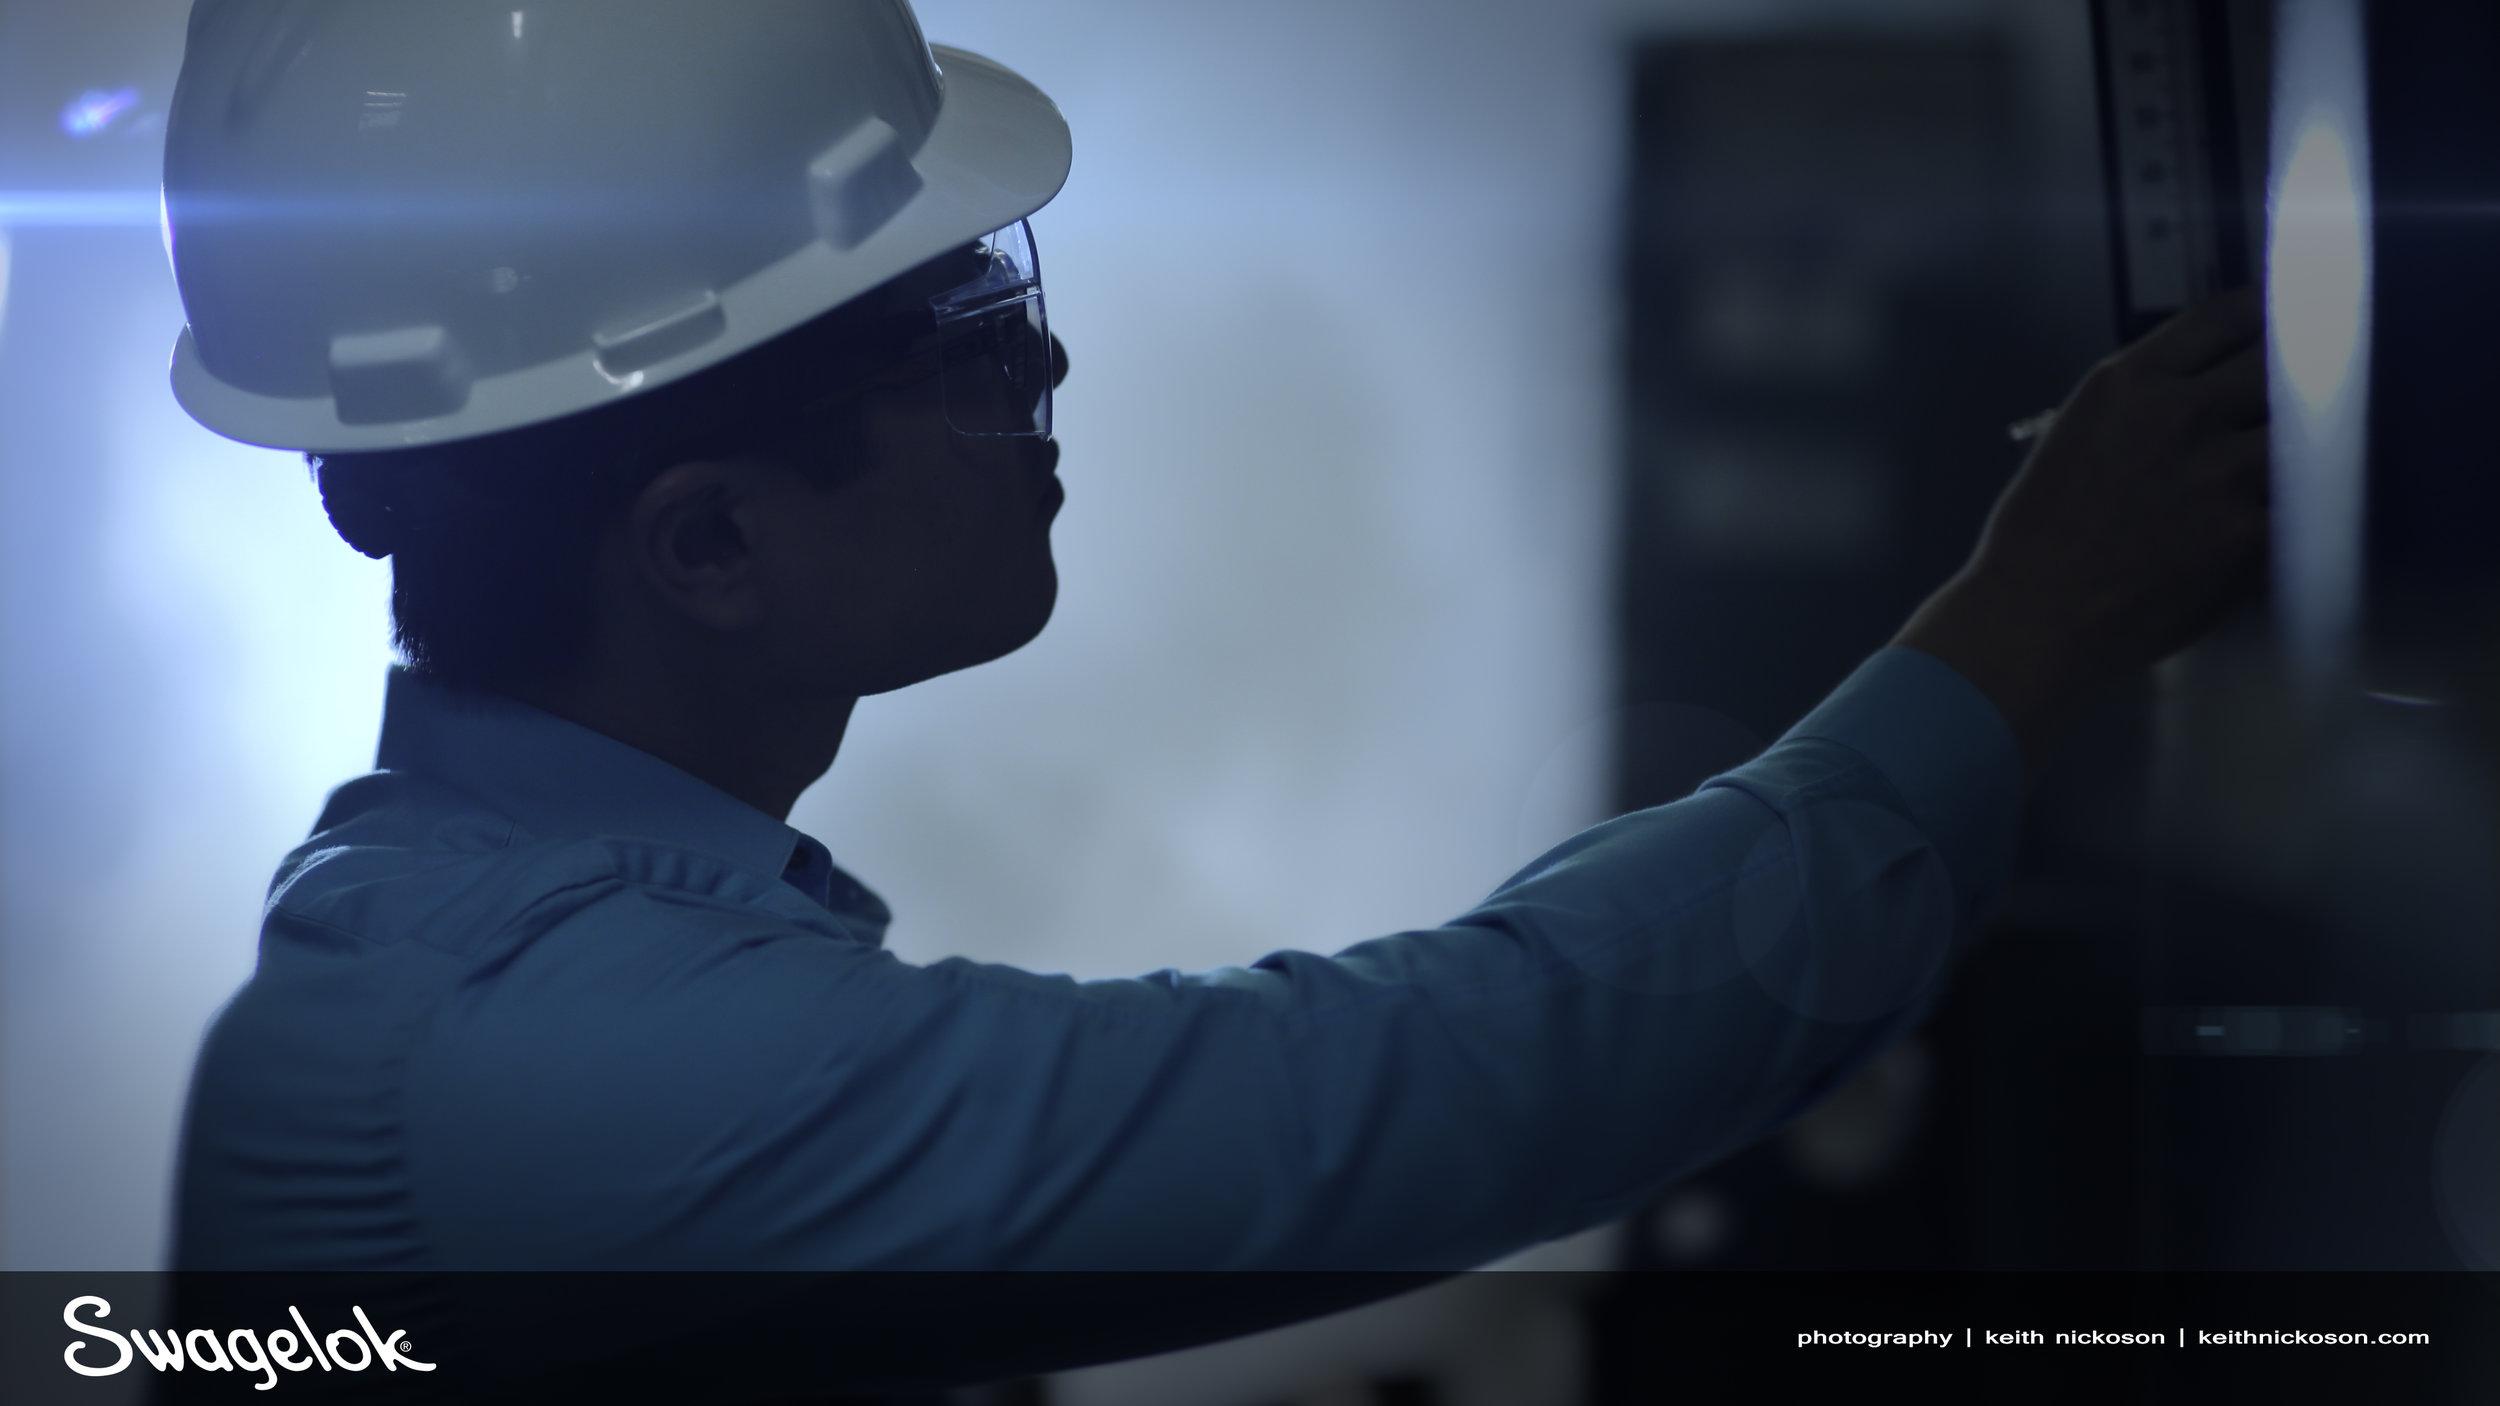 Swagelok Worker 9 - Keith Nickoson.jpg